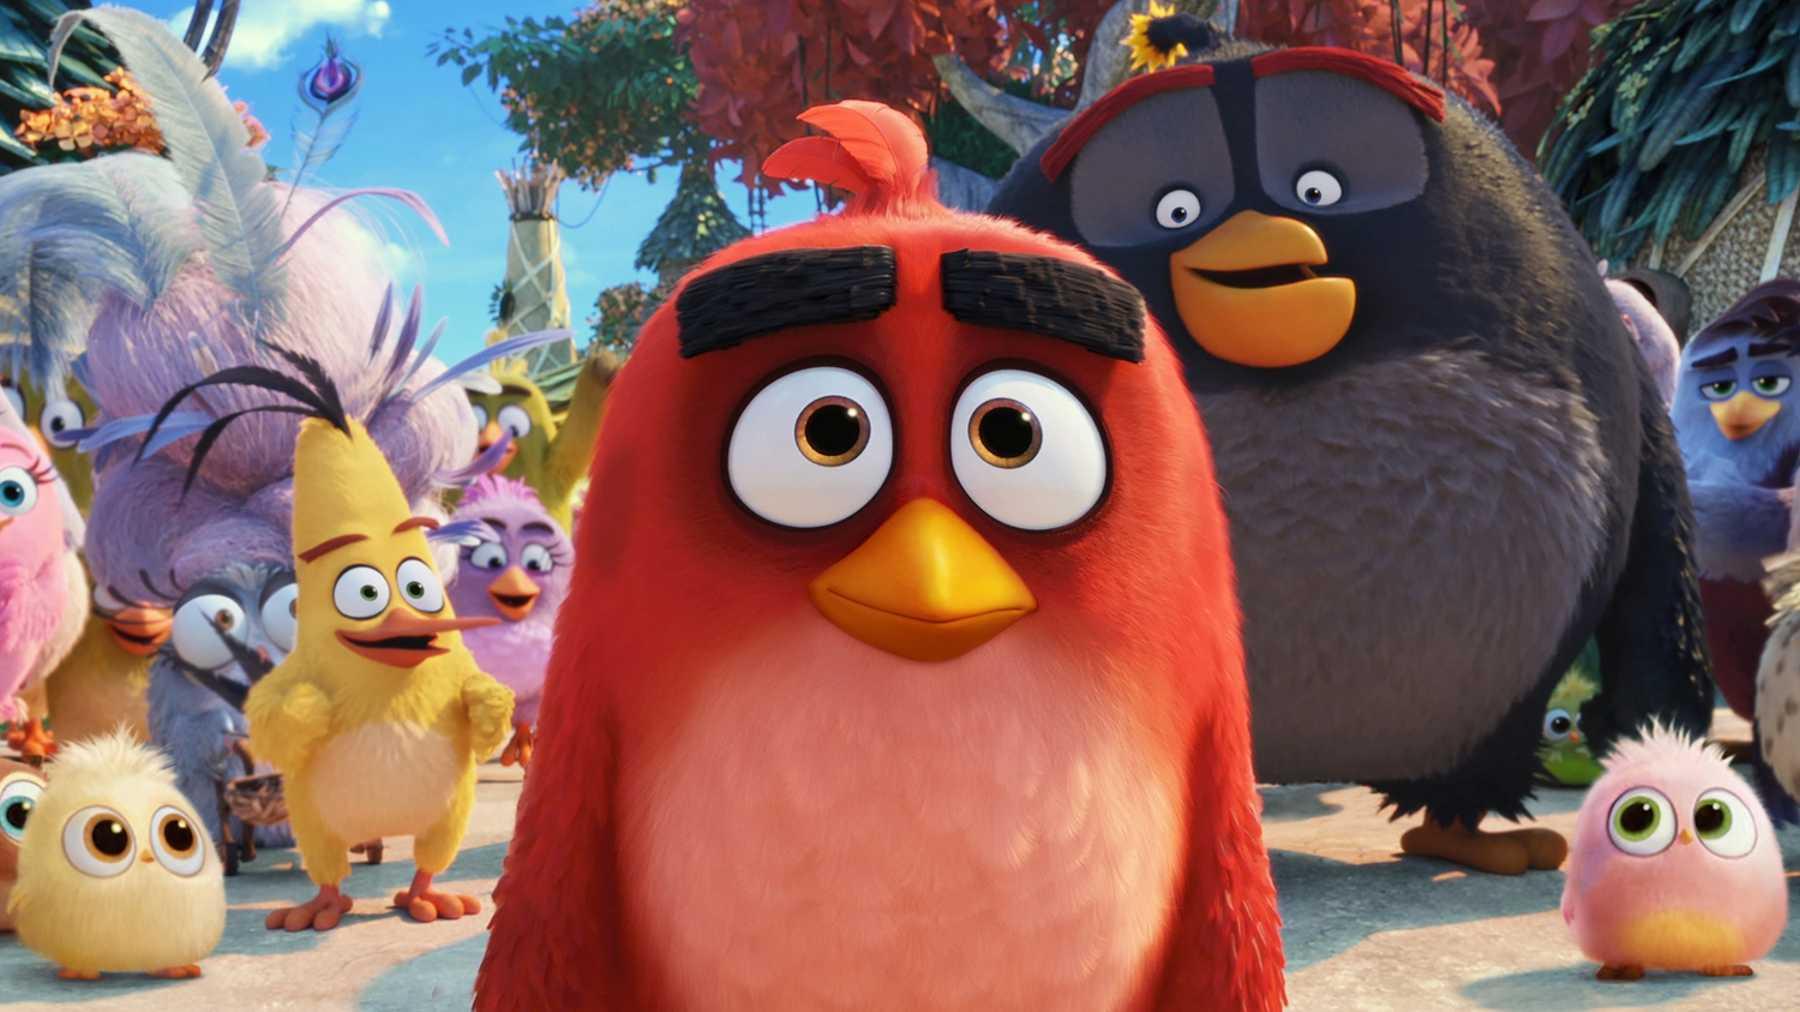 Popularitas Angry Birds